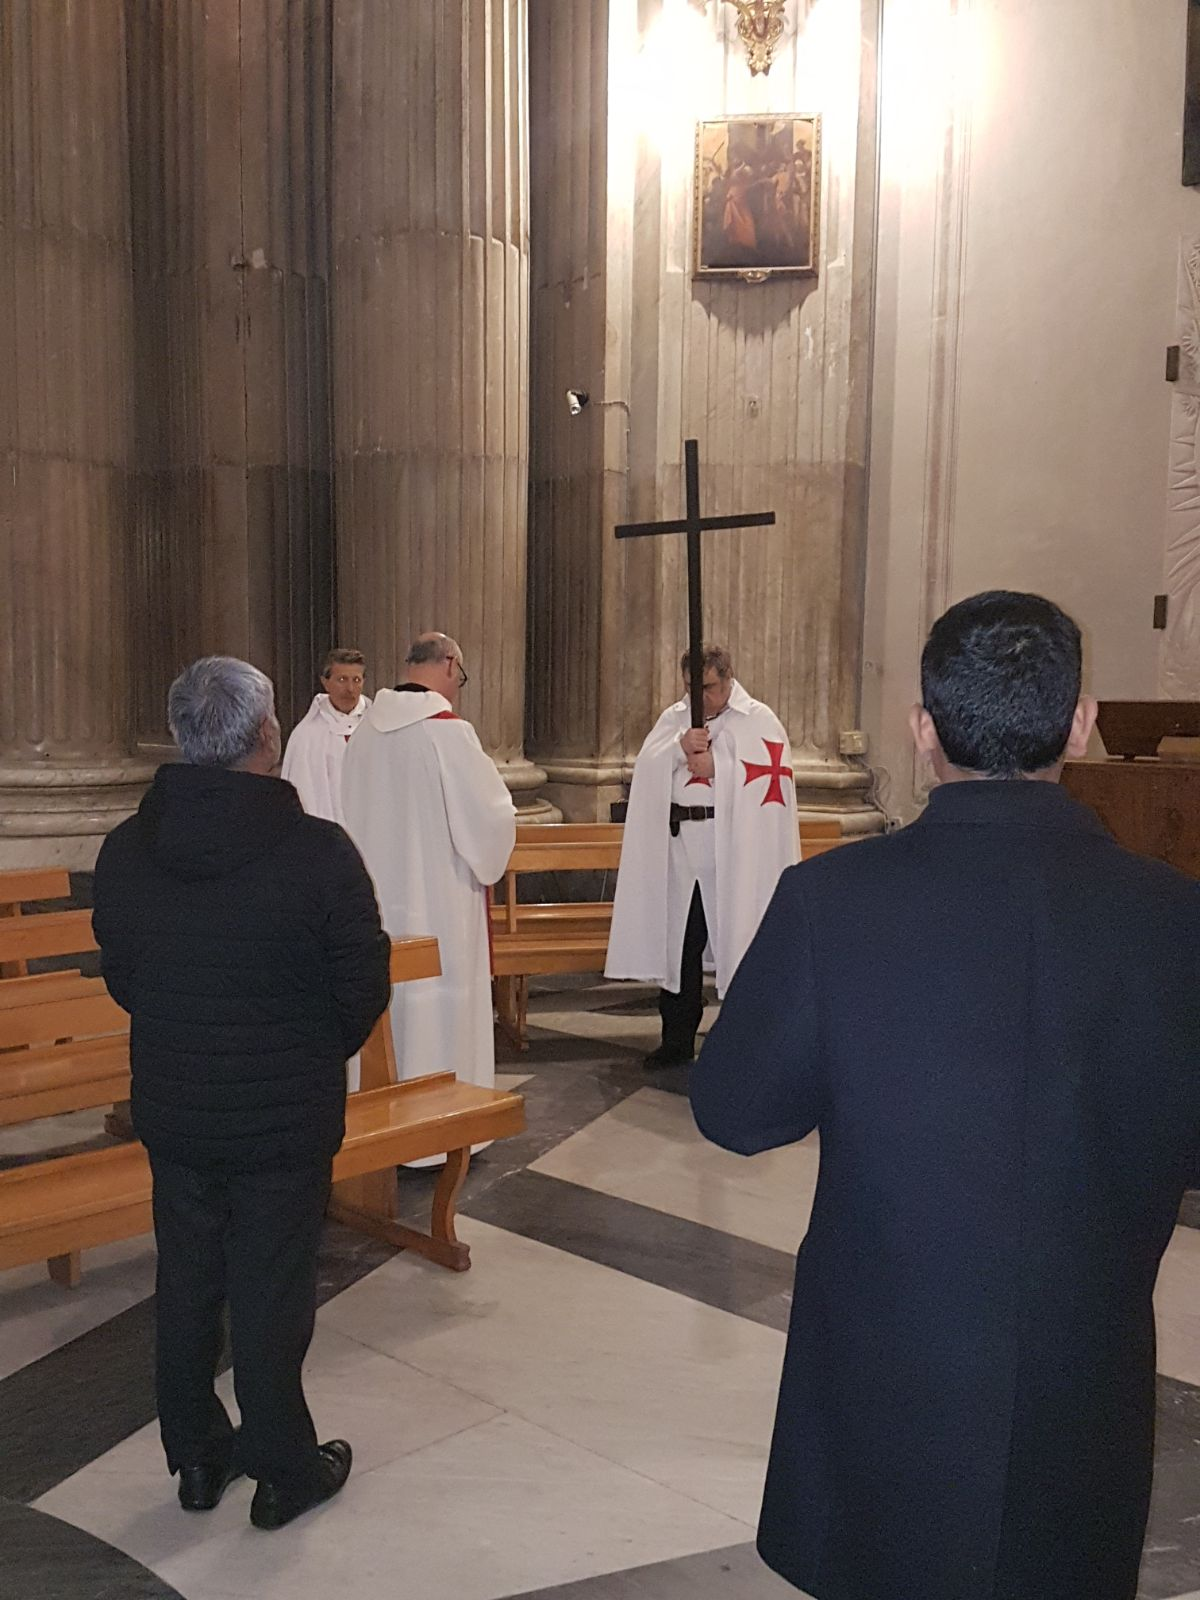 16feb2018 - Basilica di Santa Maria in Portico in Campitelli - Via Crucis - Templari Cattolici - foto 3